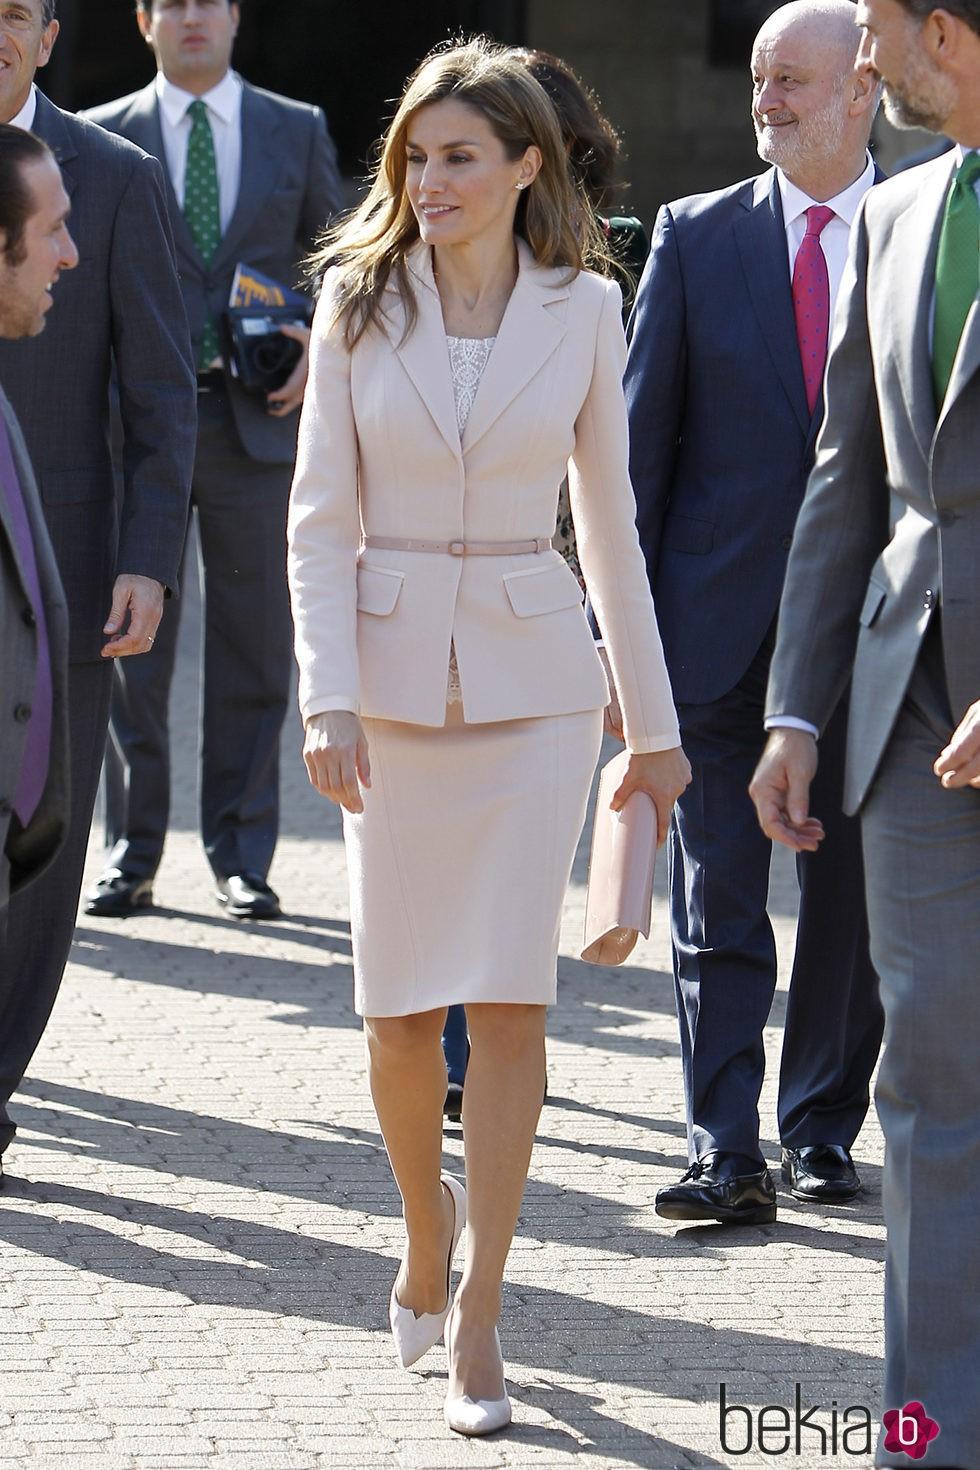 82361_princesa-letizia-universidad-stanford-traje-rosa.jpg